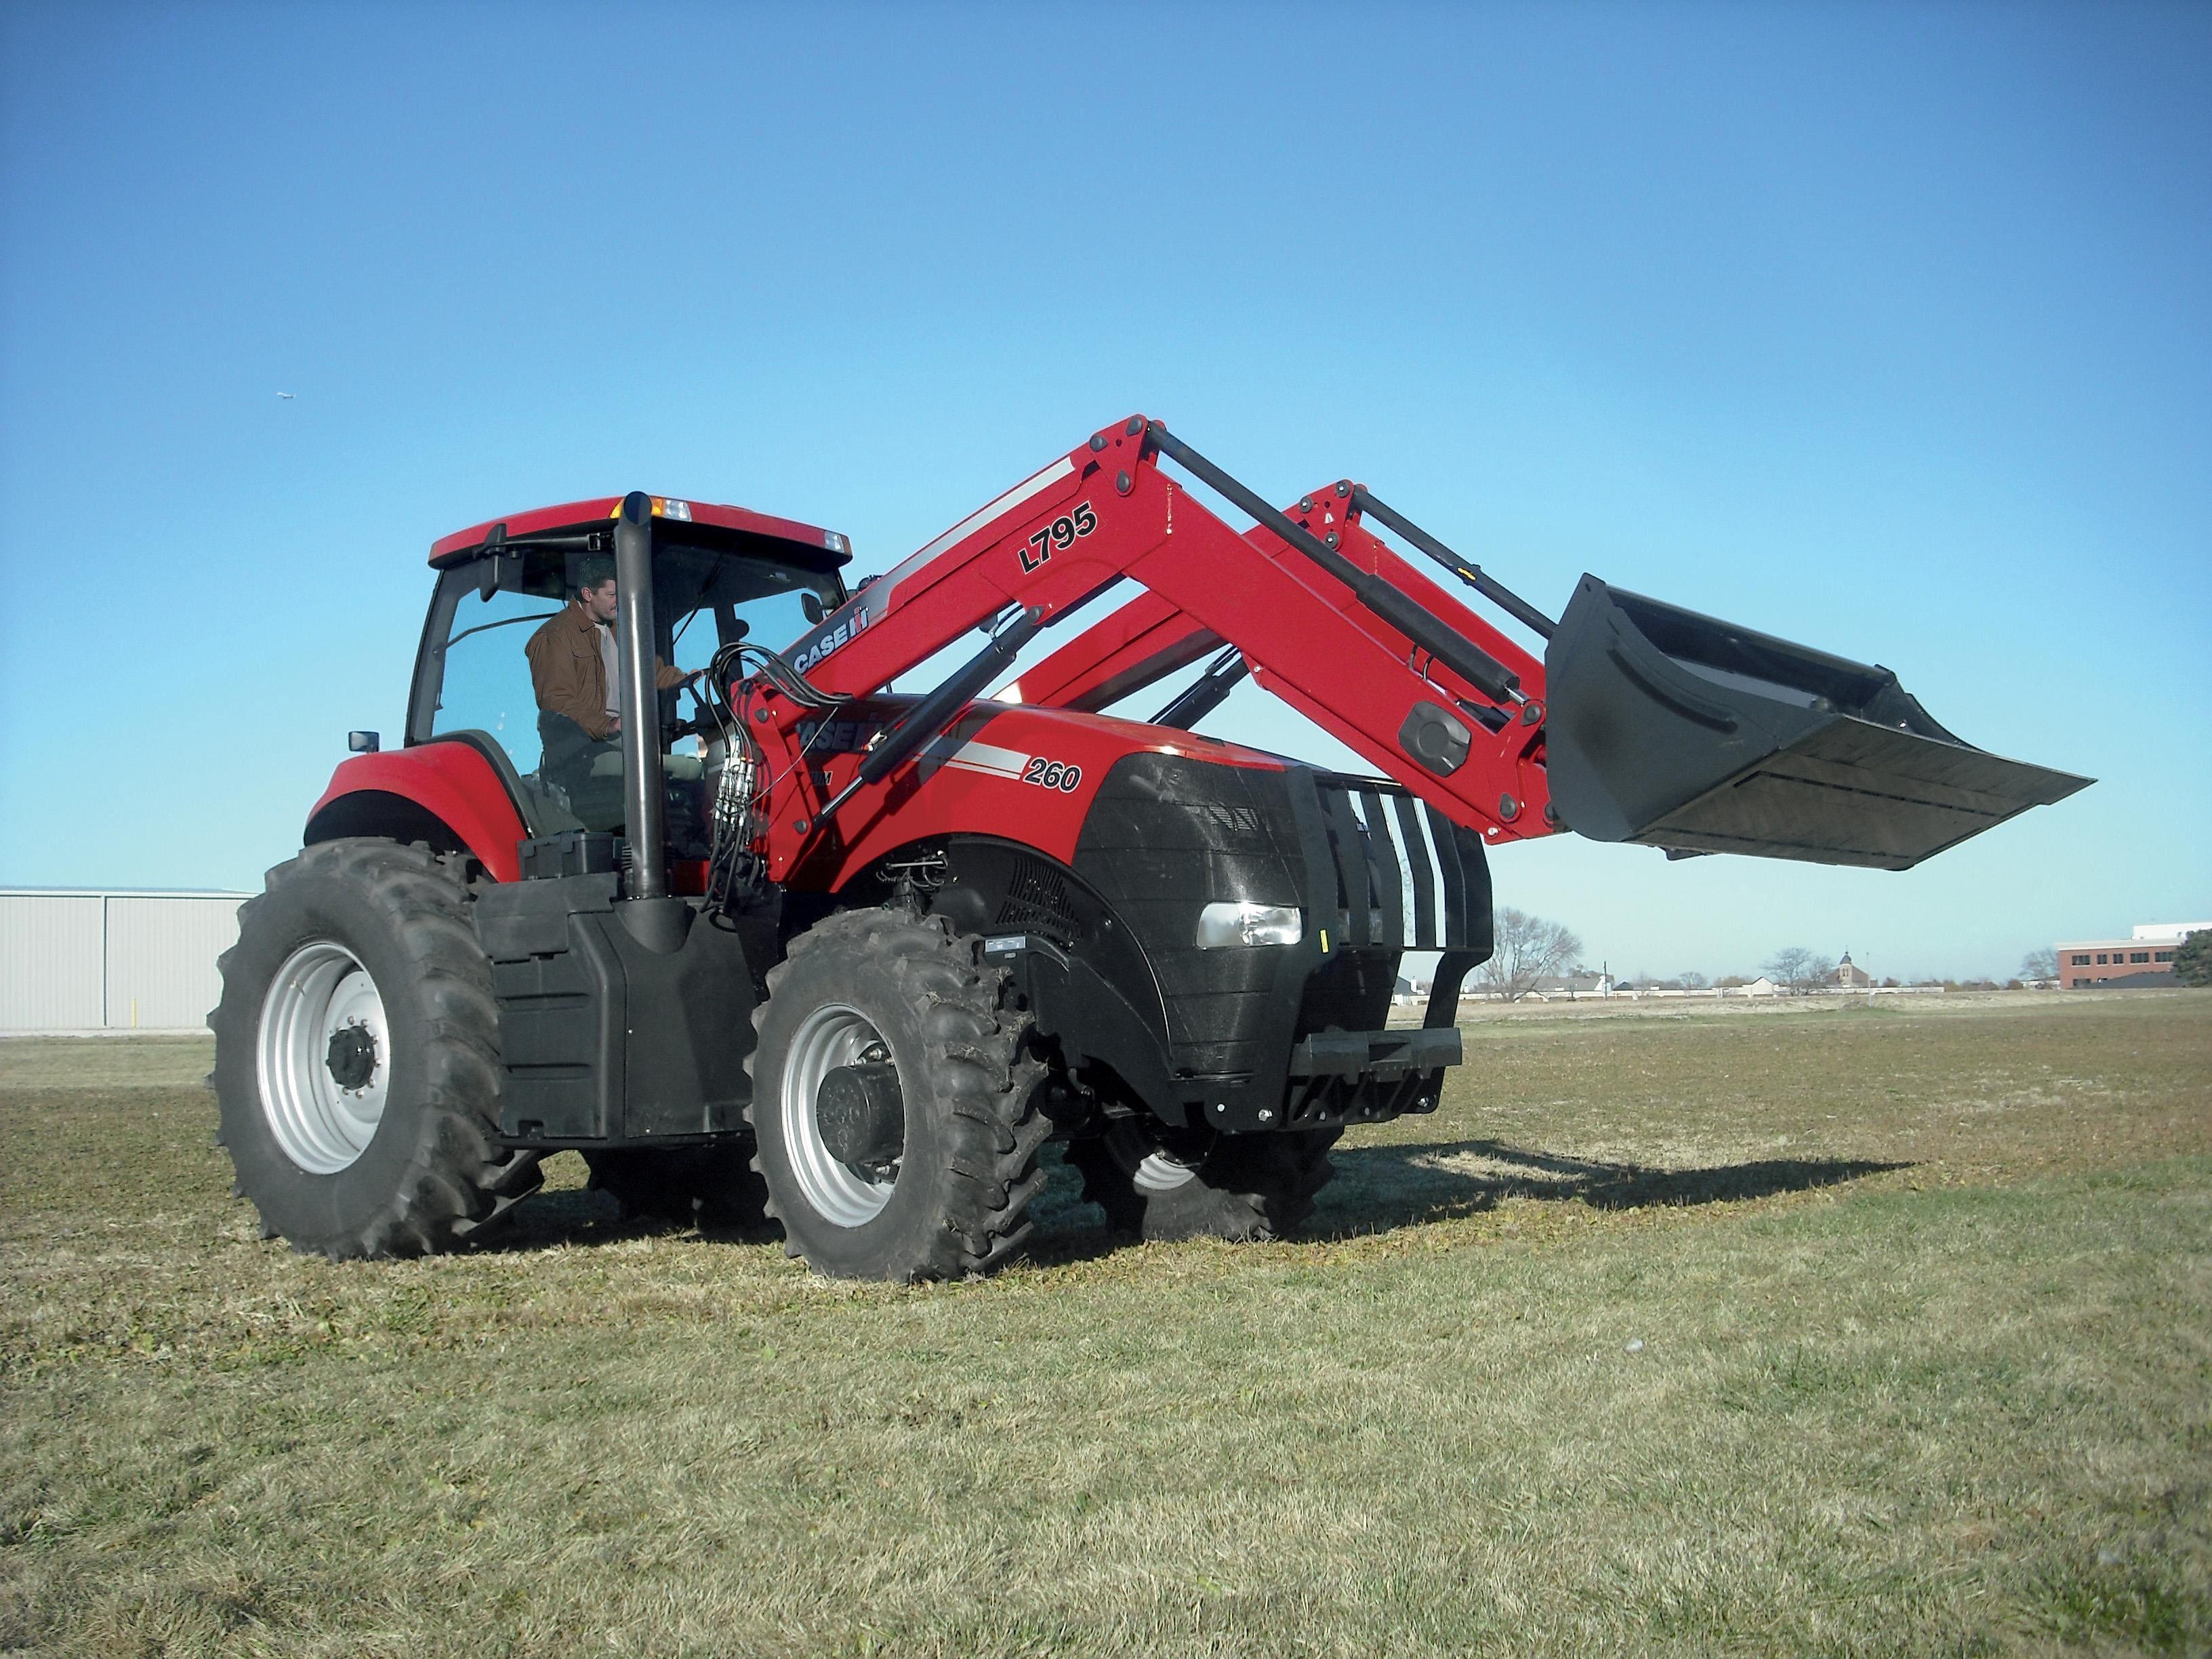 magnum_260_dscf5129_11 10_mr?width=360&height=252 l705 series loaders farm loaders case ih